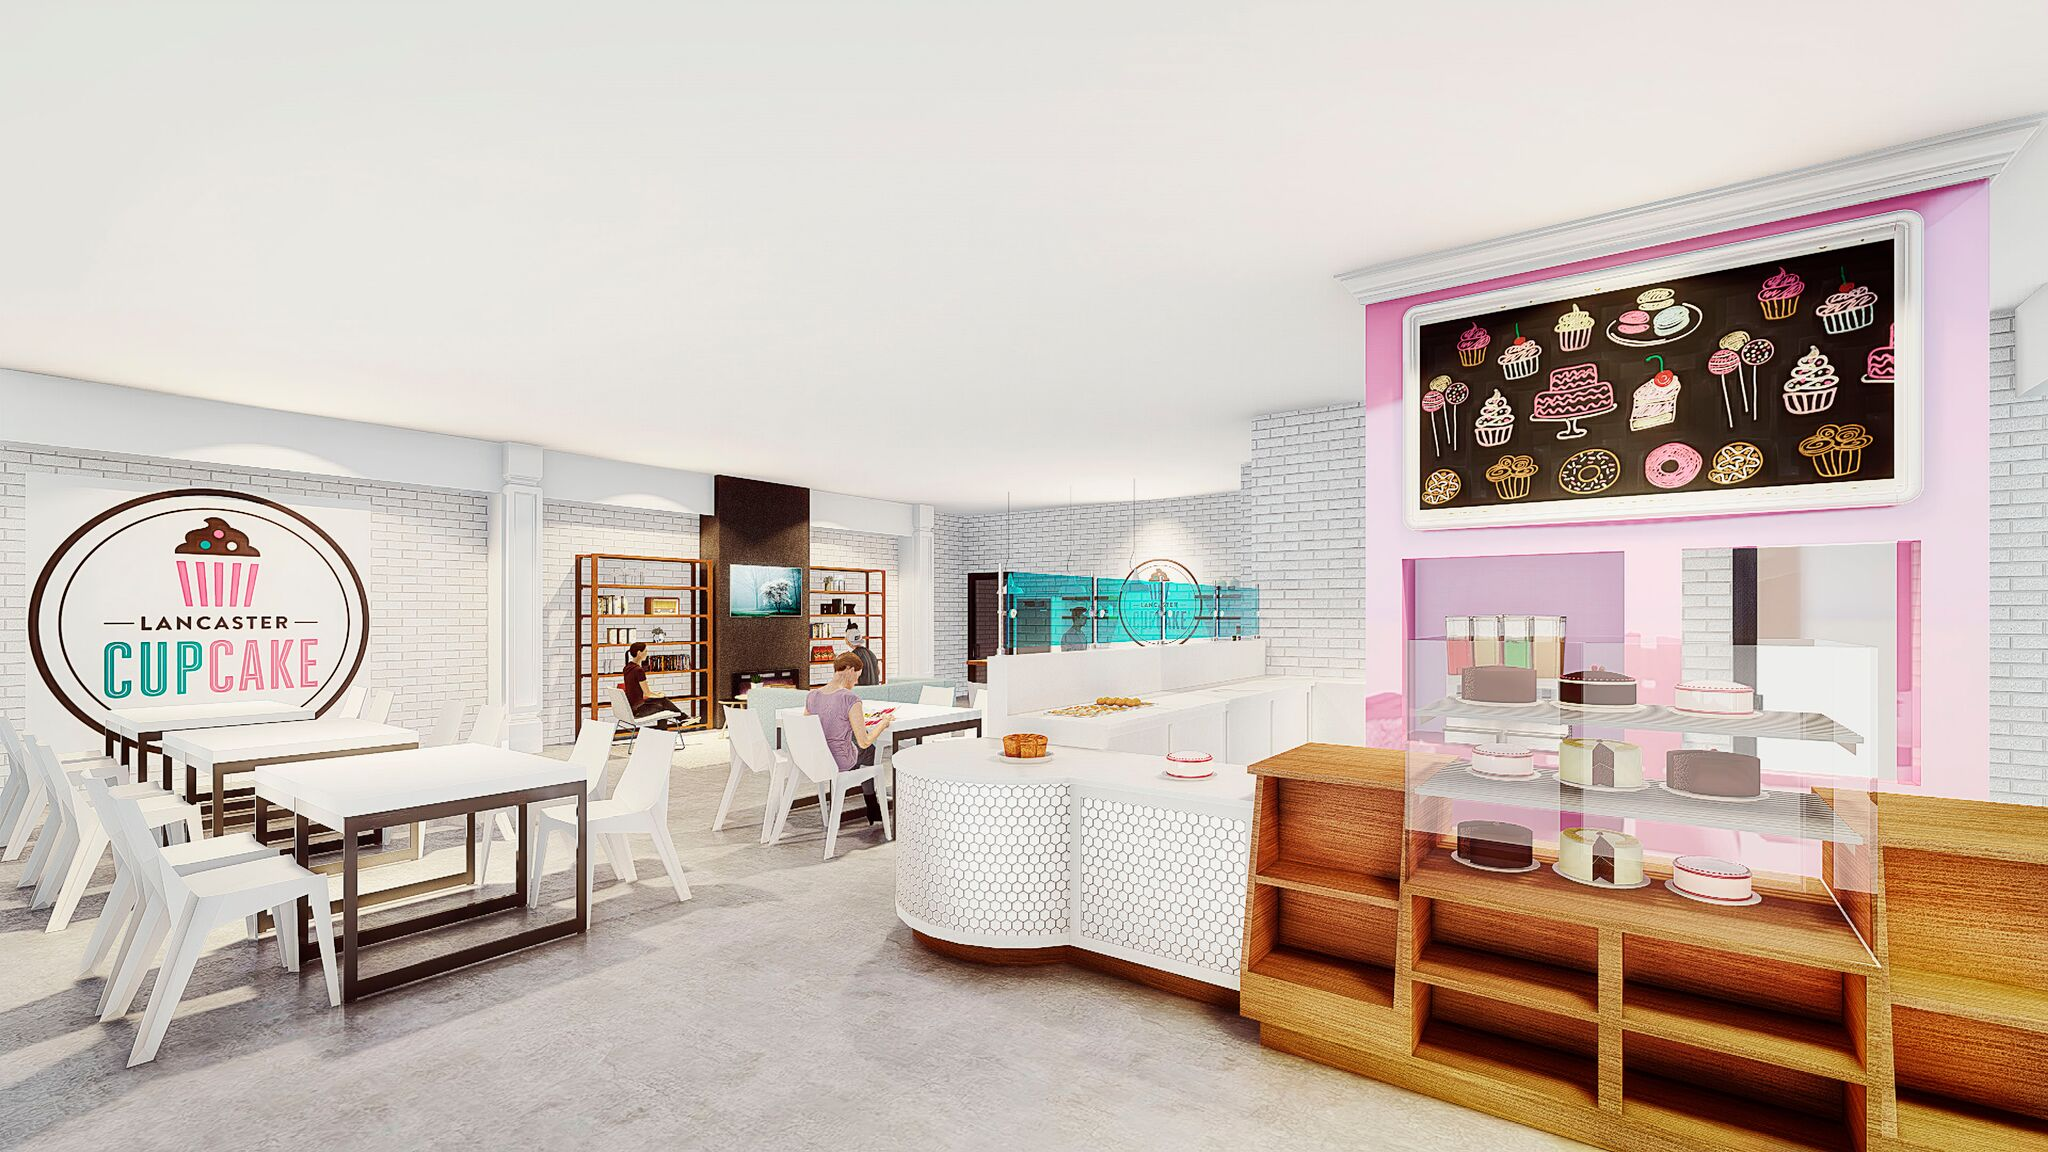 Retail Store Architecture